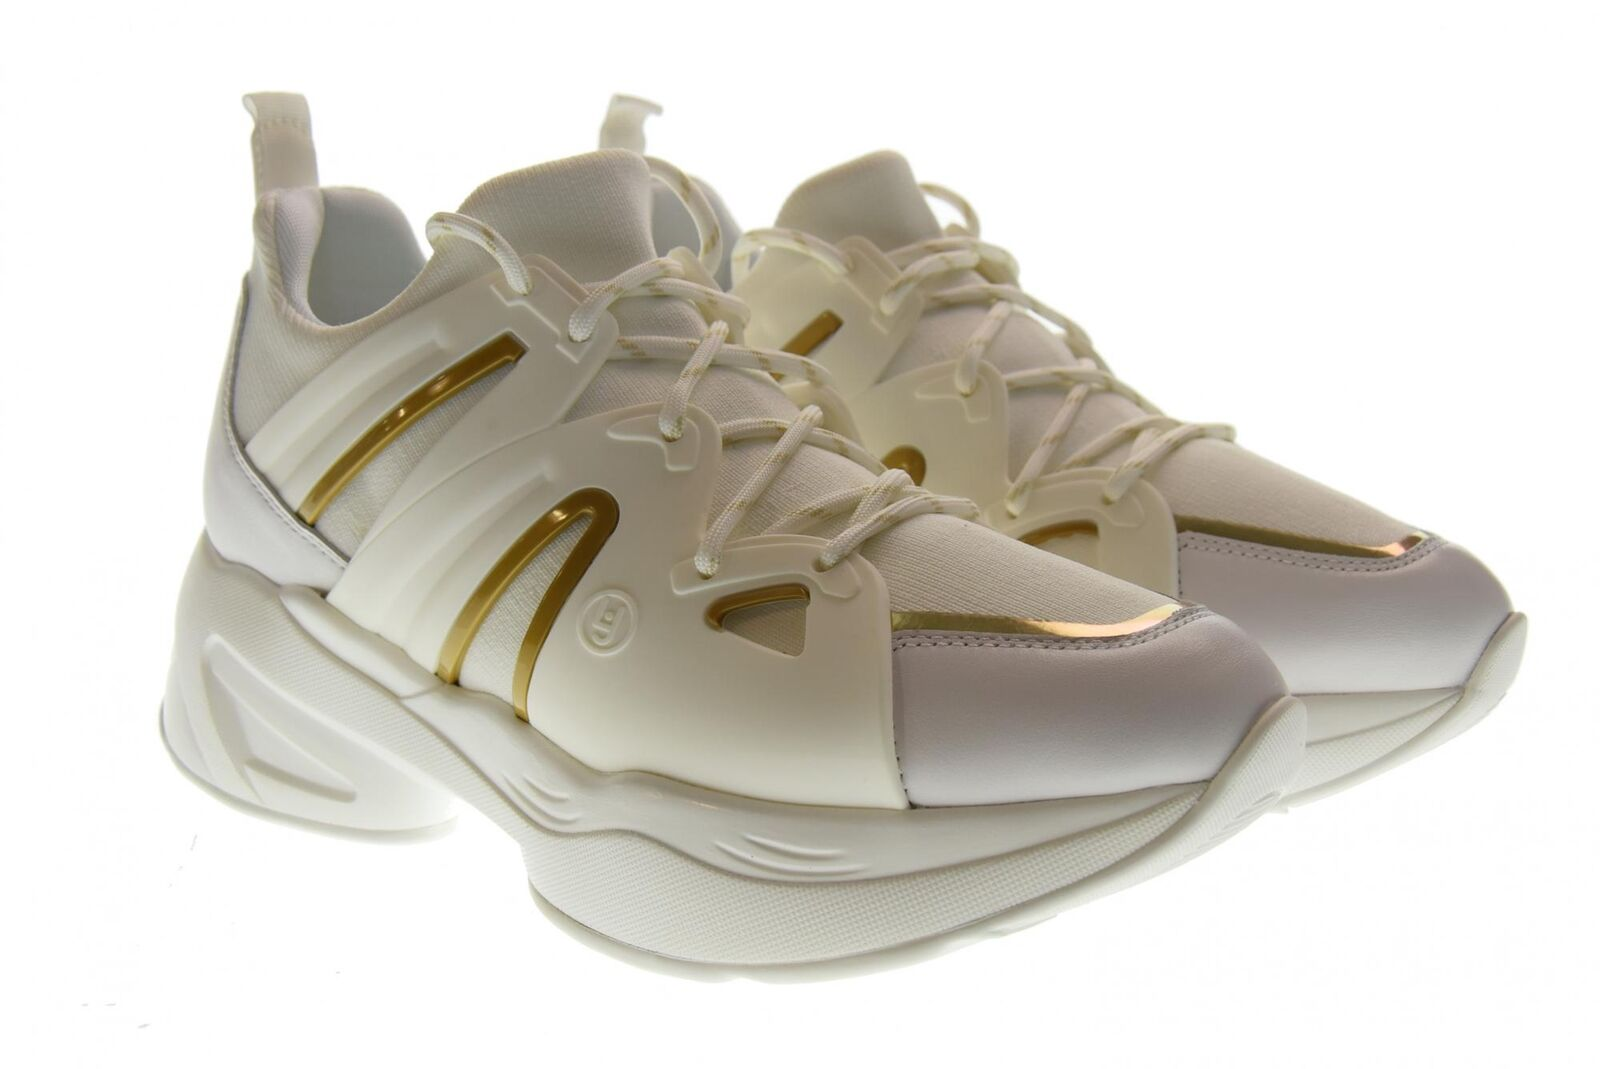 Liu Jo donna scarpe da ginnastica bassa JOG 07 07 07 SOCK scarpe da ginnastica B19037 TX038 P19 | Affidabile Reputazione  0cb712